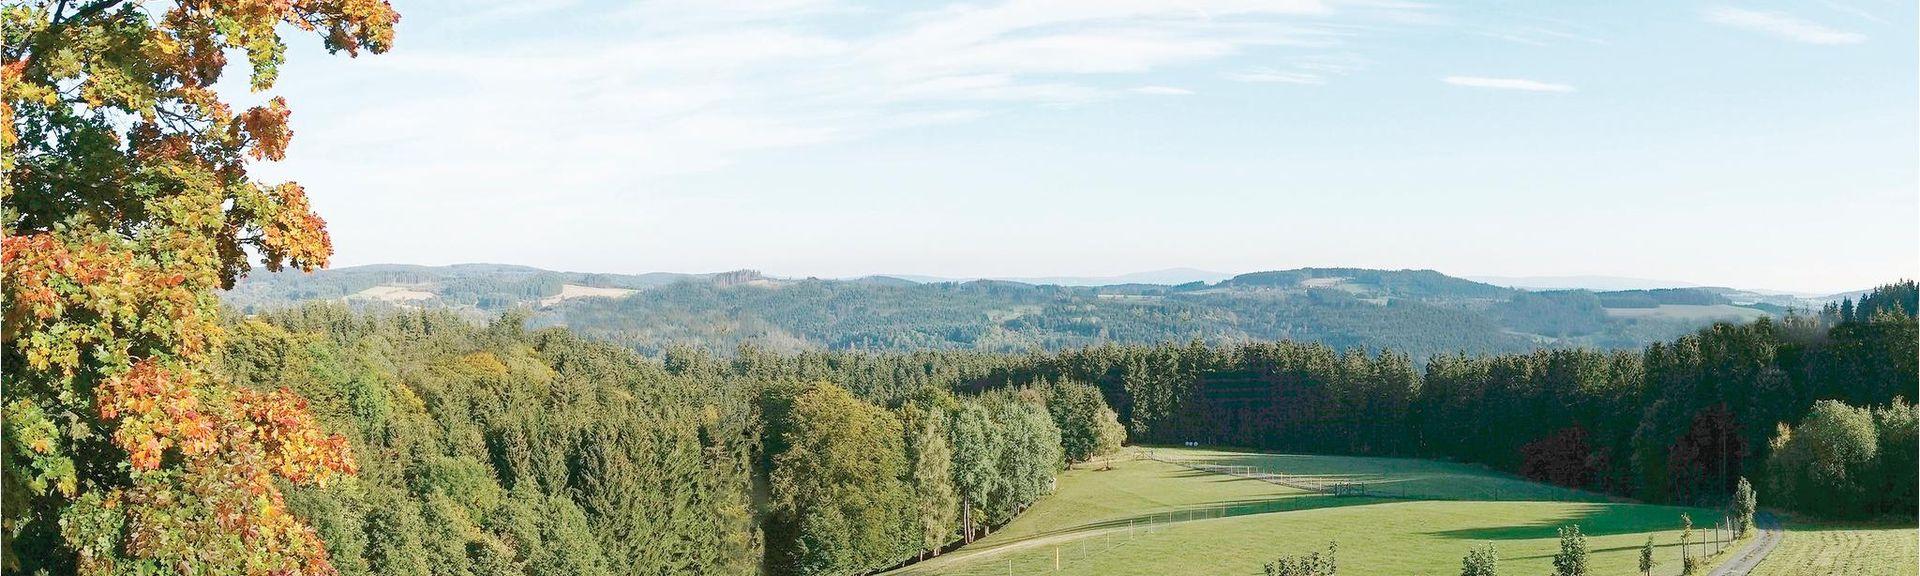 Ochsenkopf, Bischofsgrüner Forst, Germany